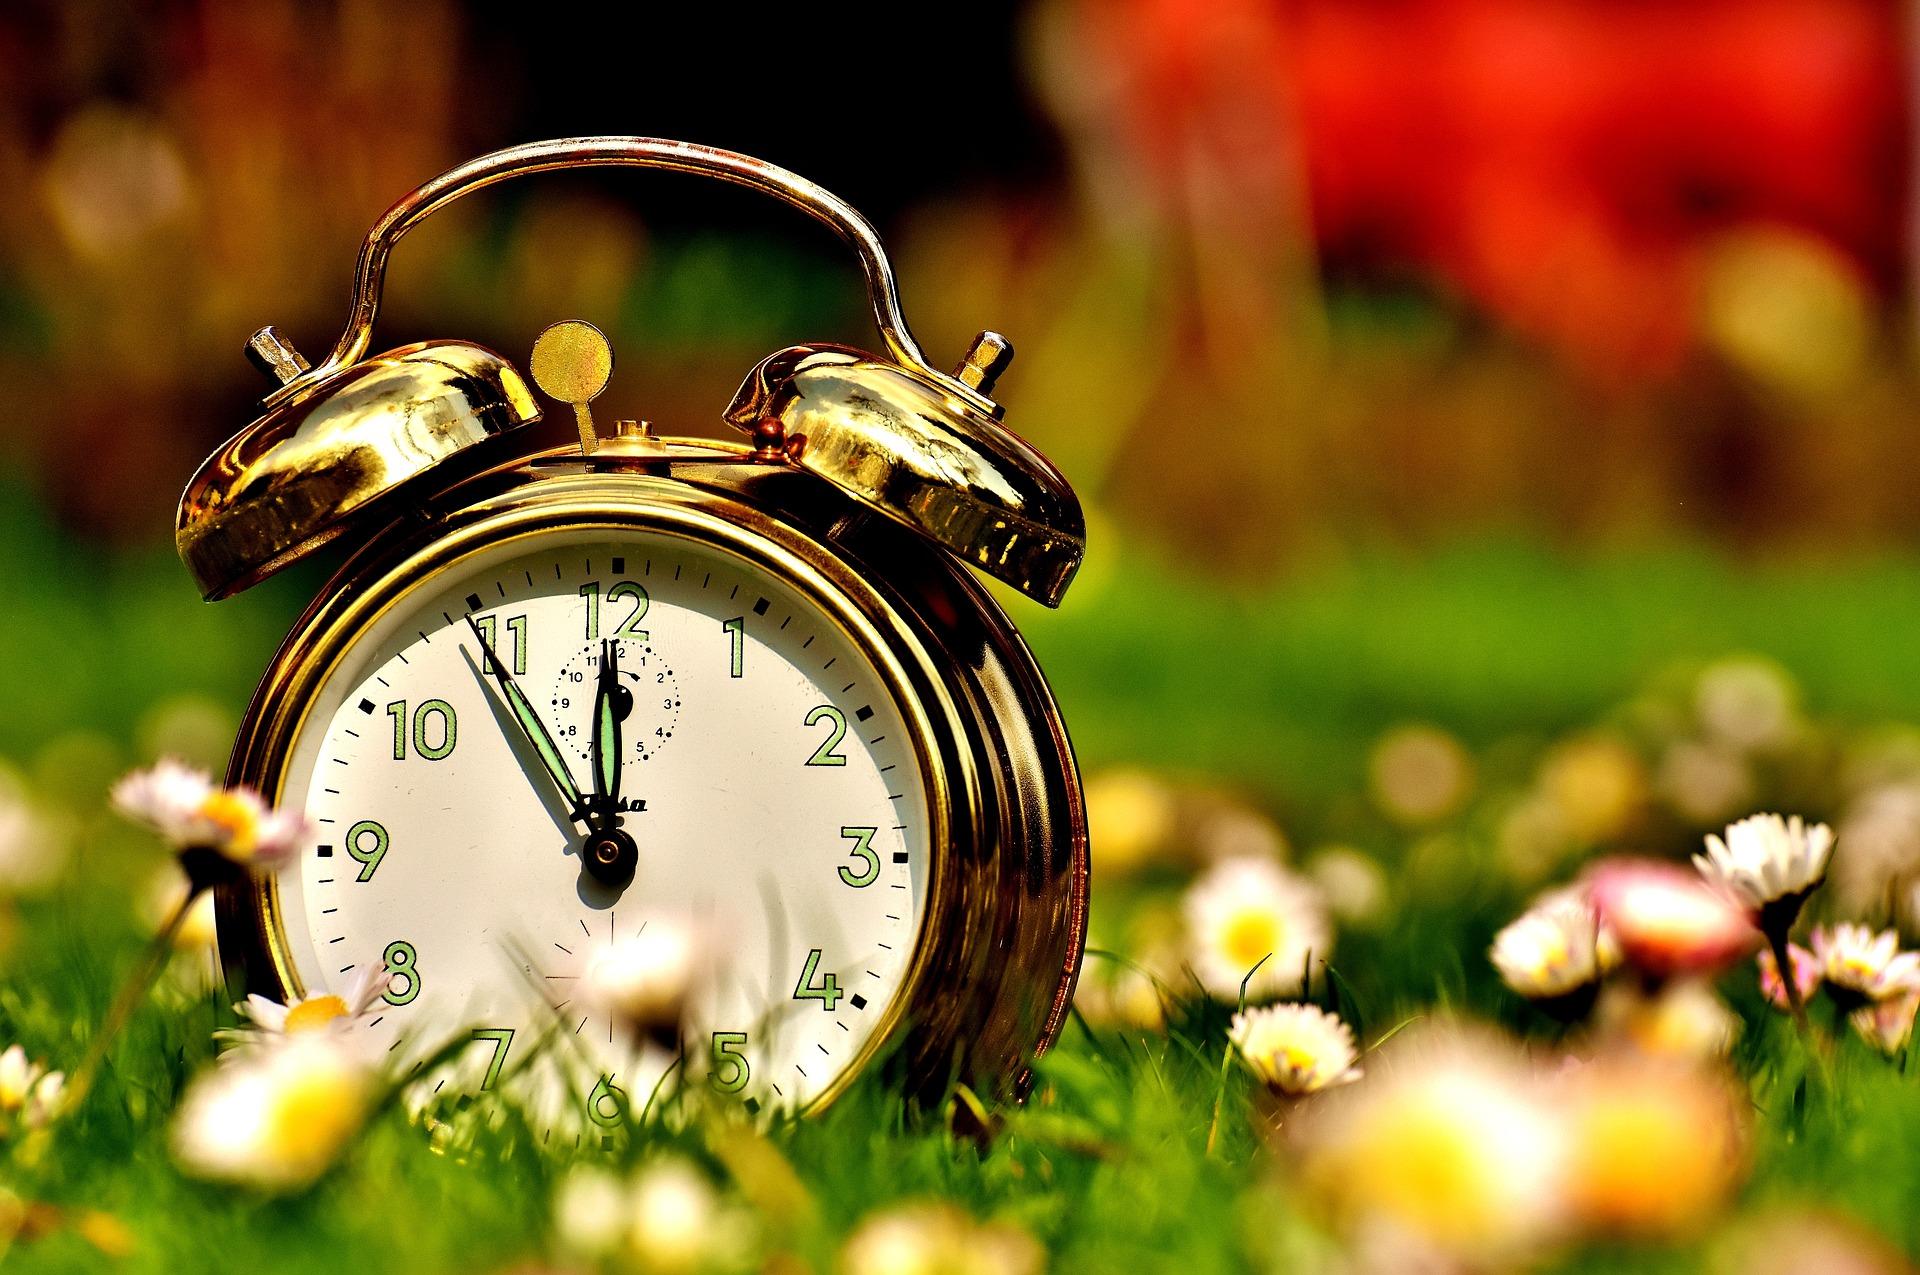 Alarm clock sitting in a meadow